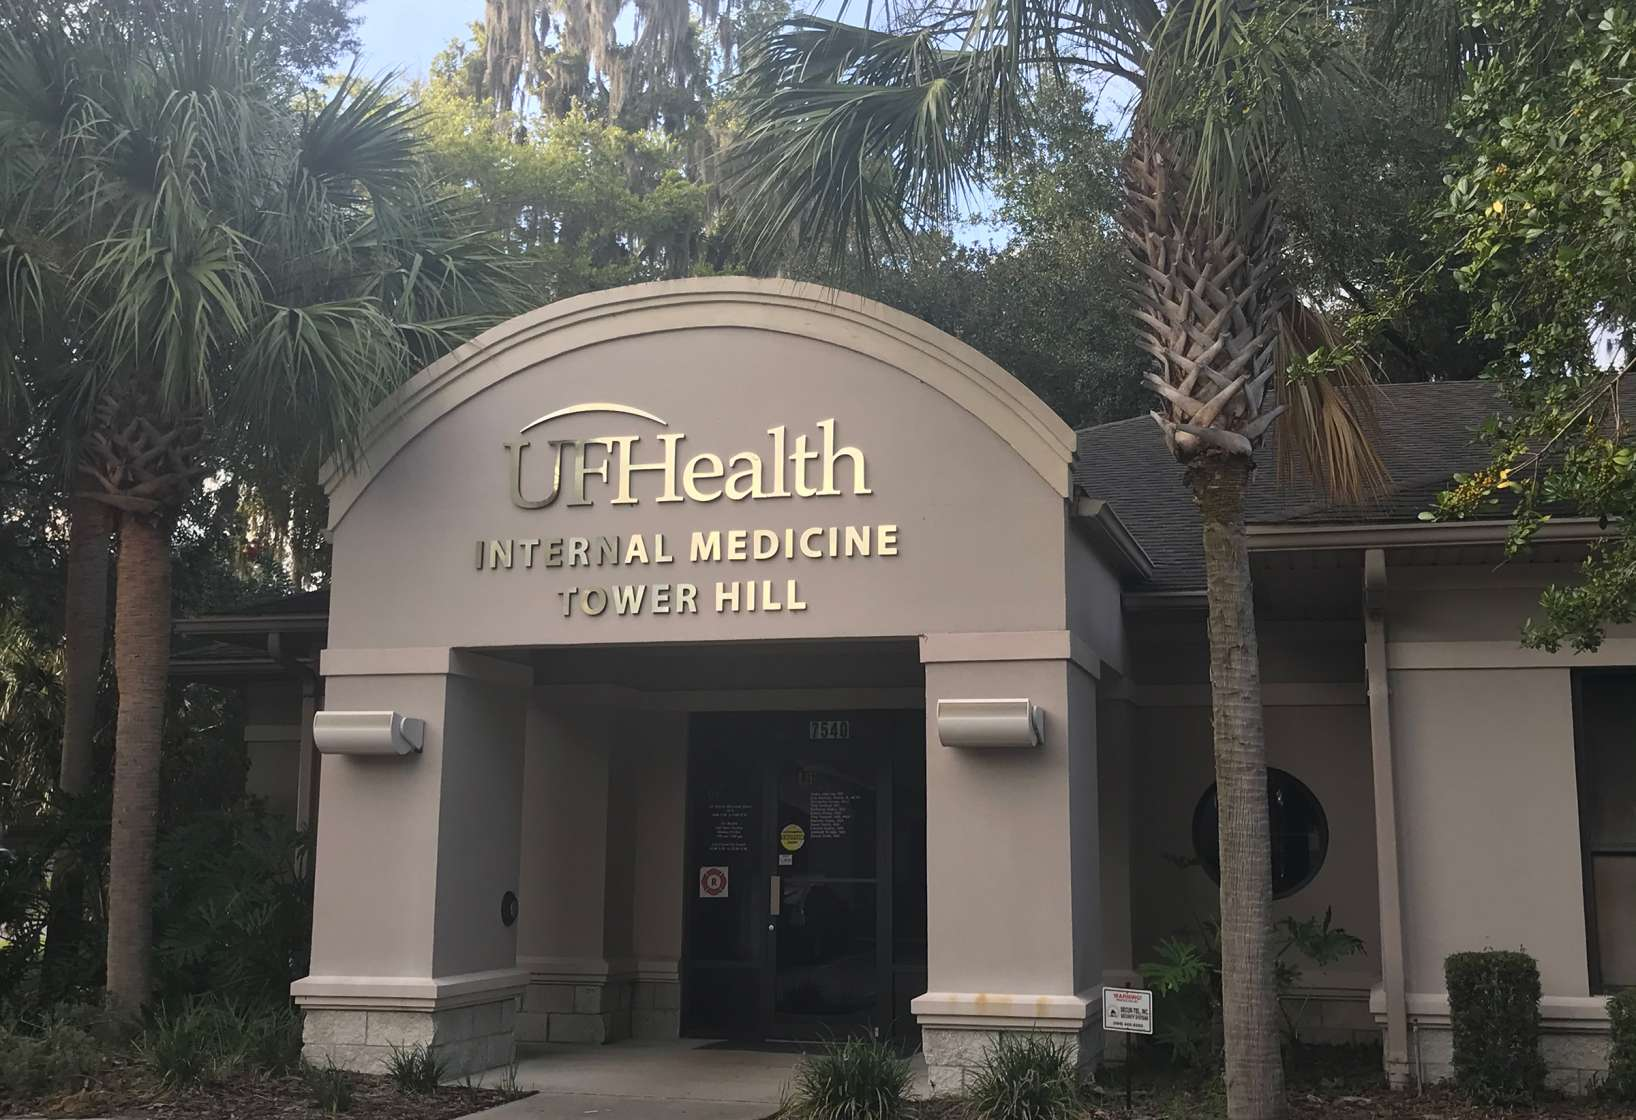 UF Health Internal Medicine - Tower Hill